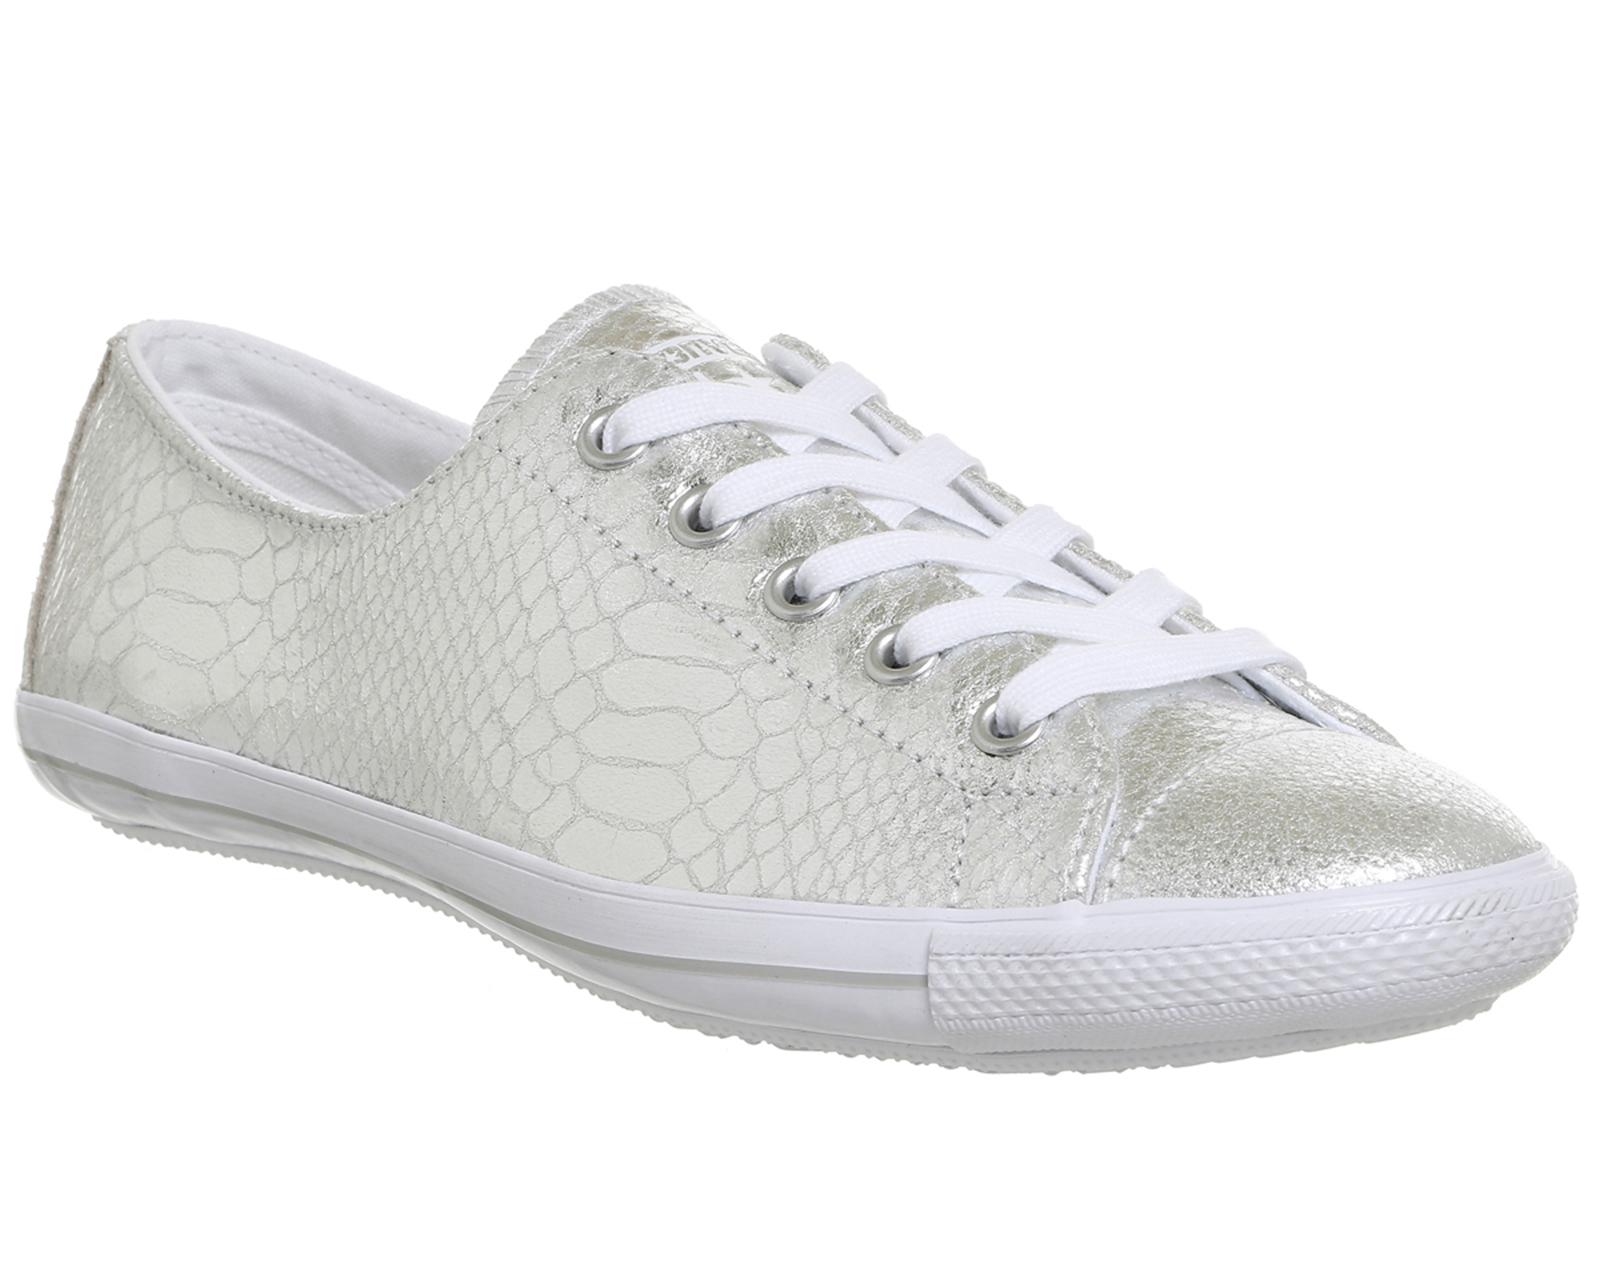 b7960719bab8 Sentinel Damen Converse Ct Lite 2 Multi SILVER METALLIC REPTILE SNAKE  Sneaker